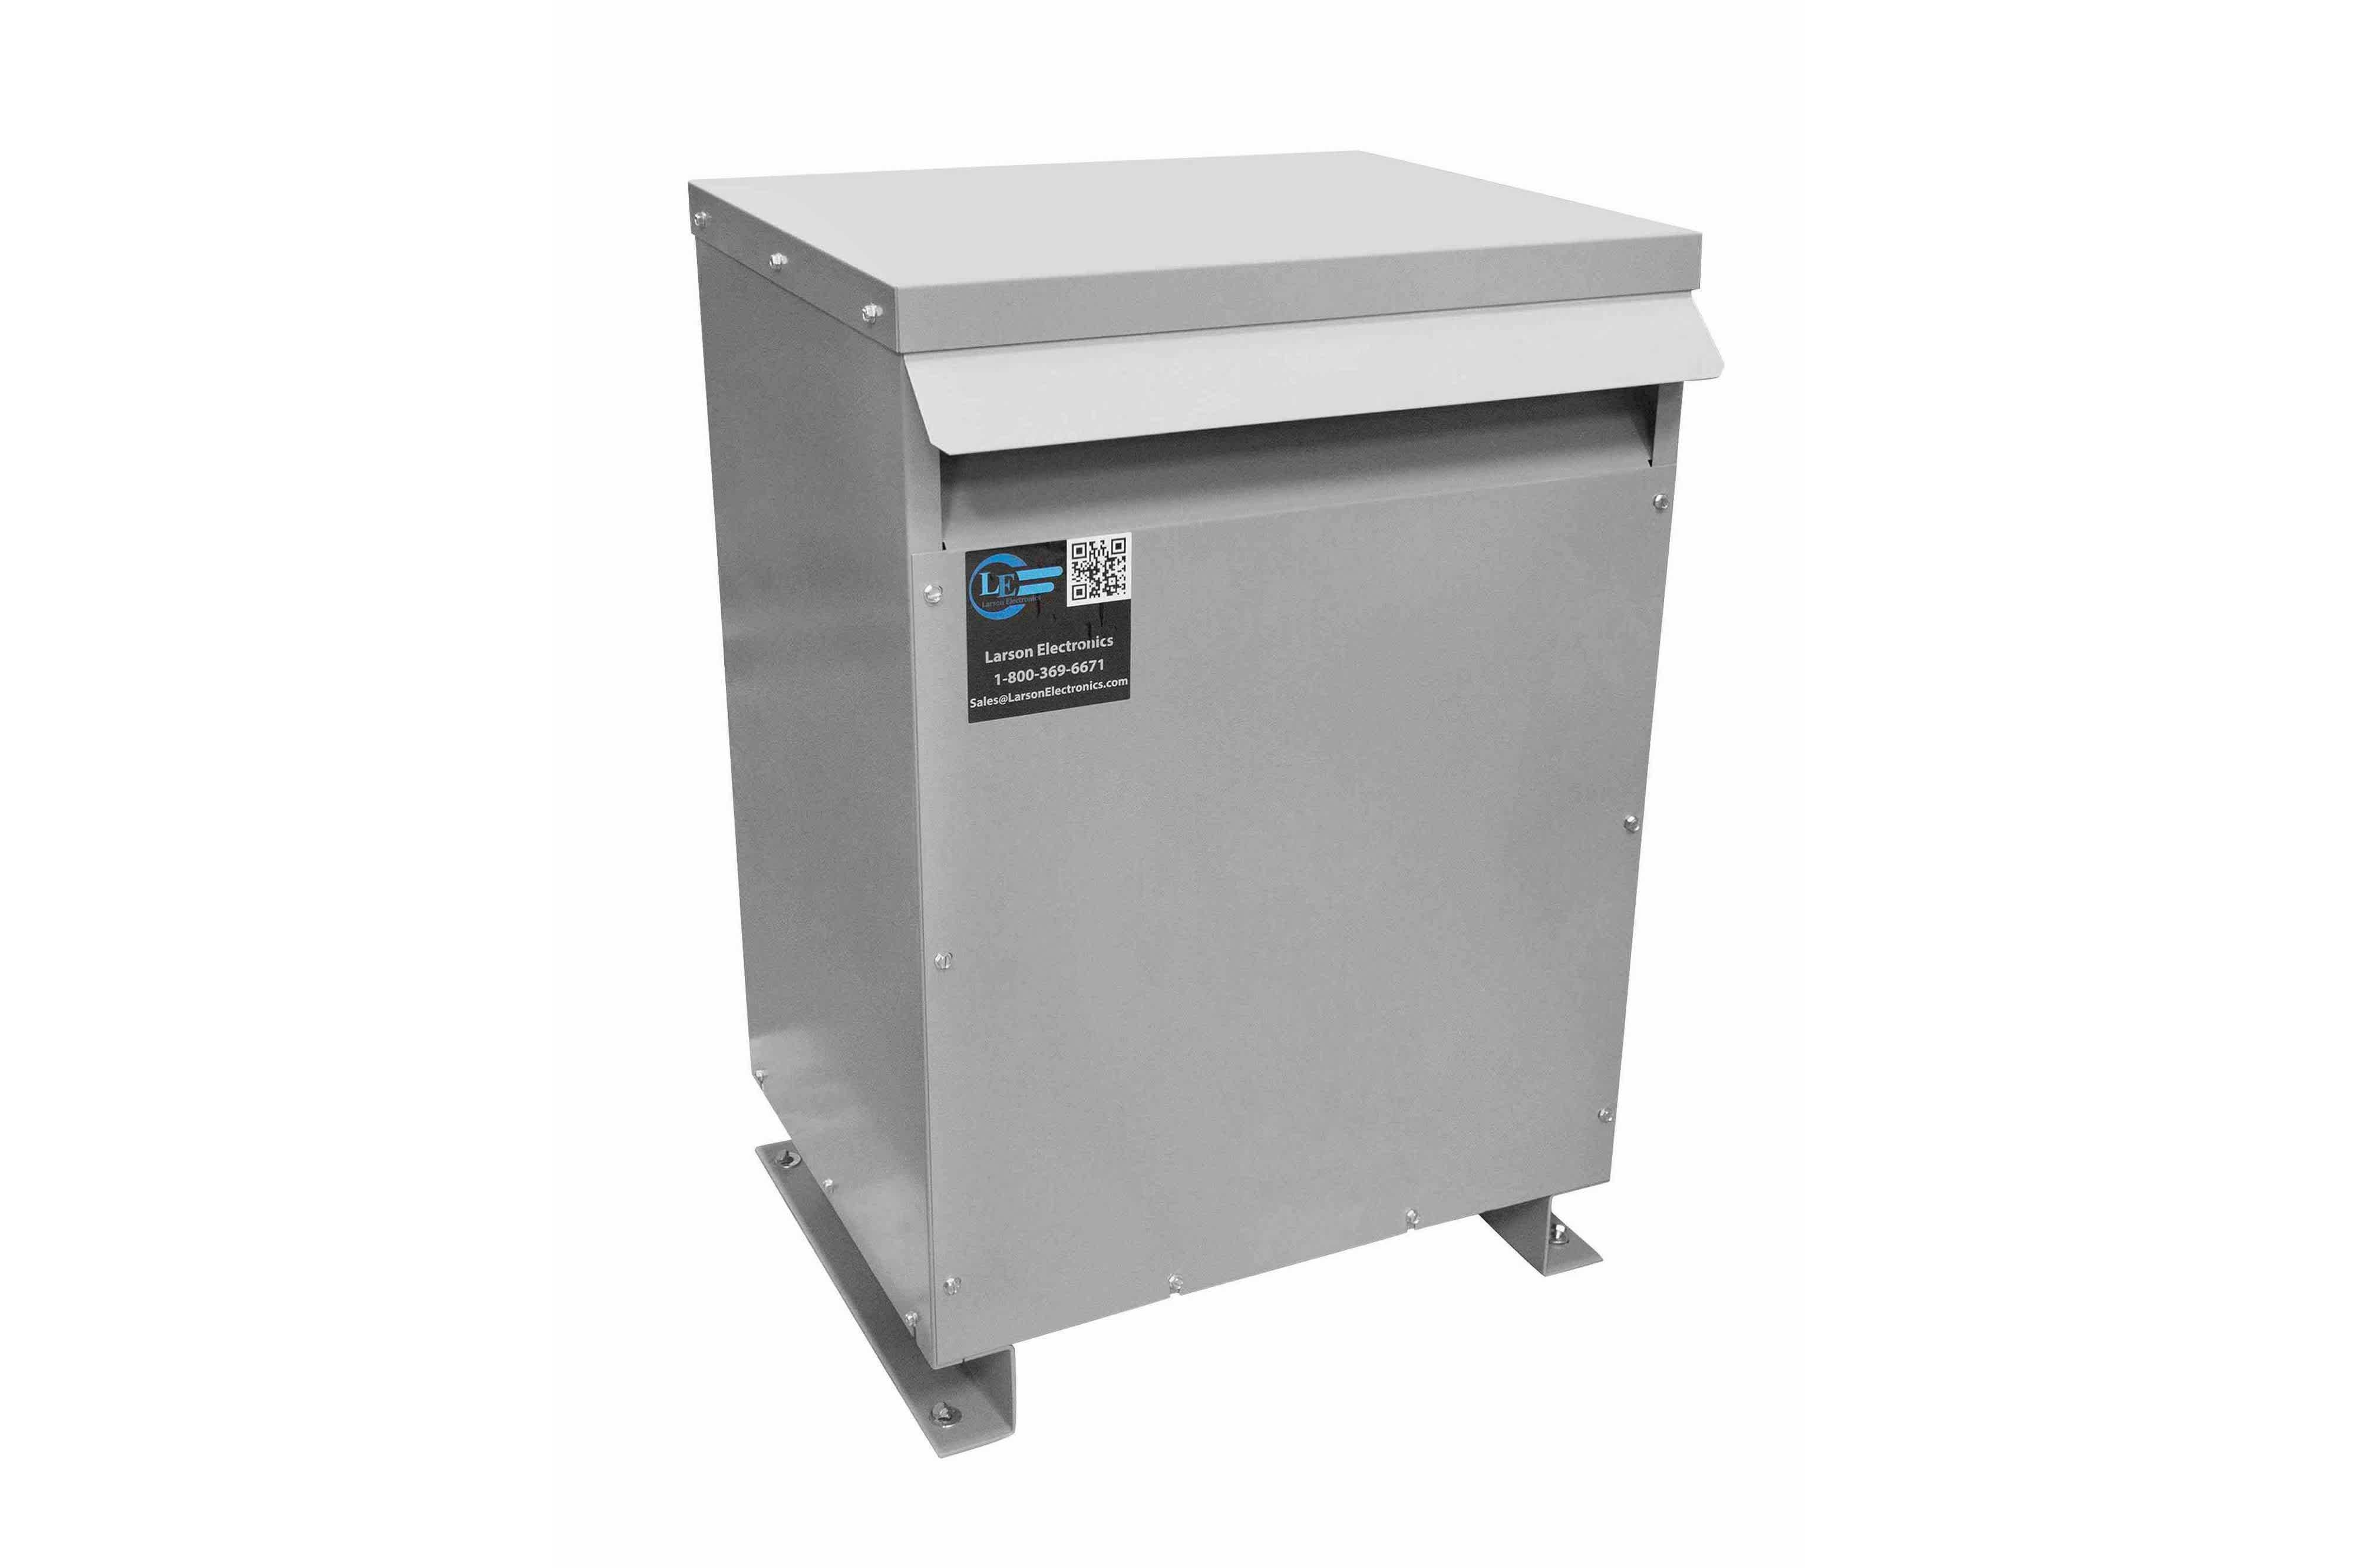 22.5 kVA 3PH Isolation Transformer, 460V Wye Primary, 208Y/120 Wye-N Secondary, N3R, Ventilated, 60 Hz